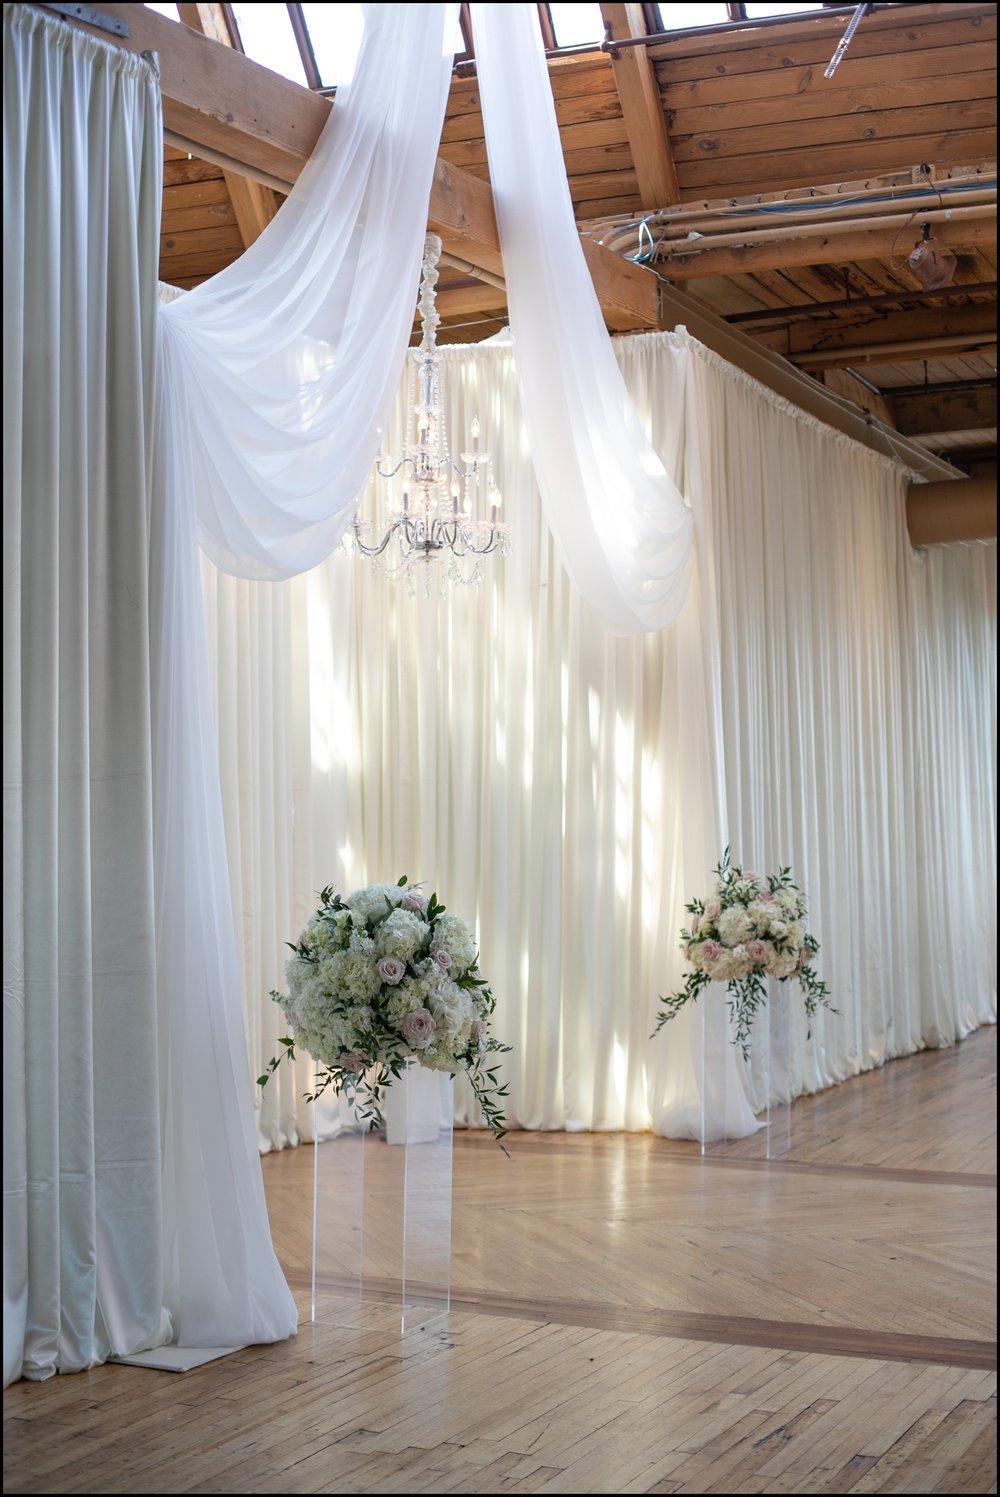 All white wedding arch